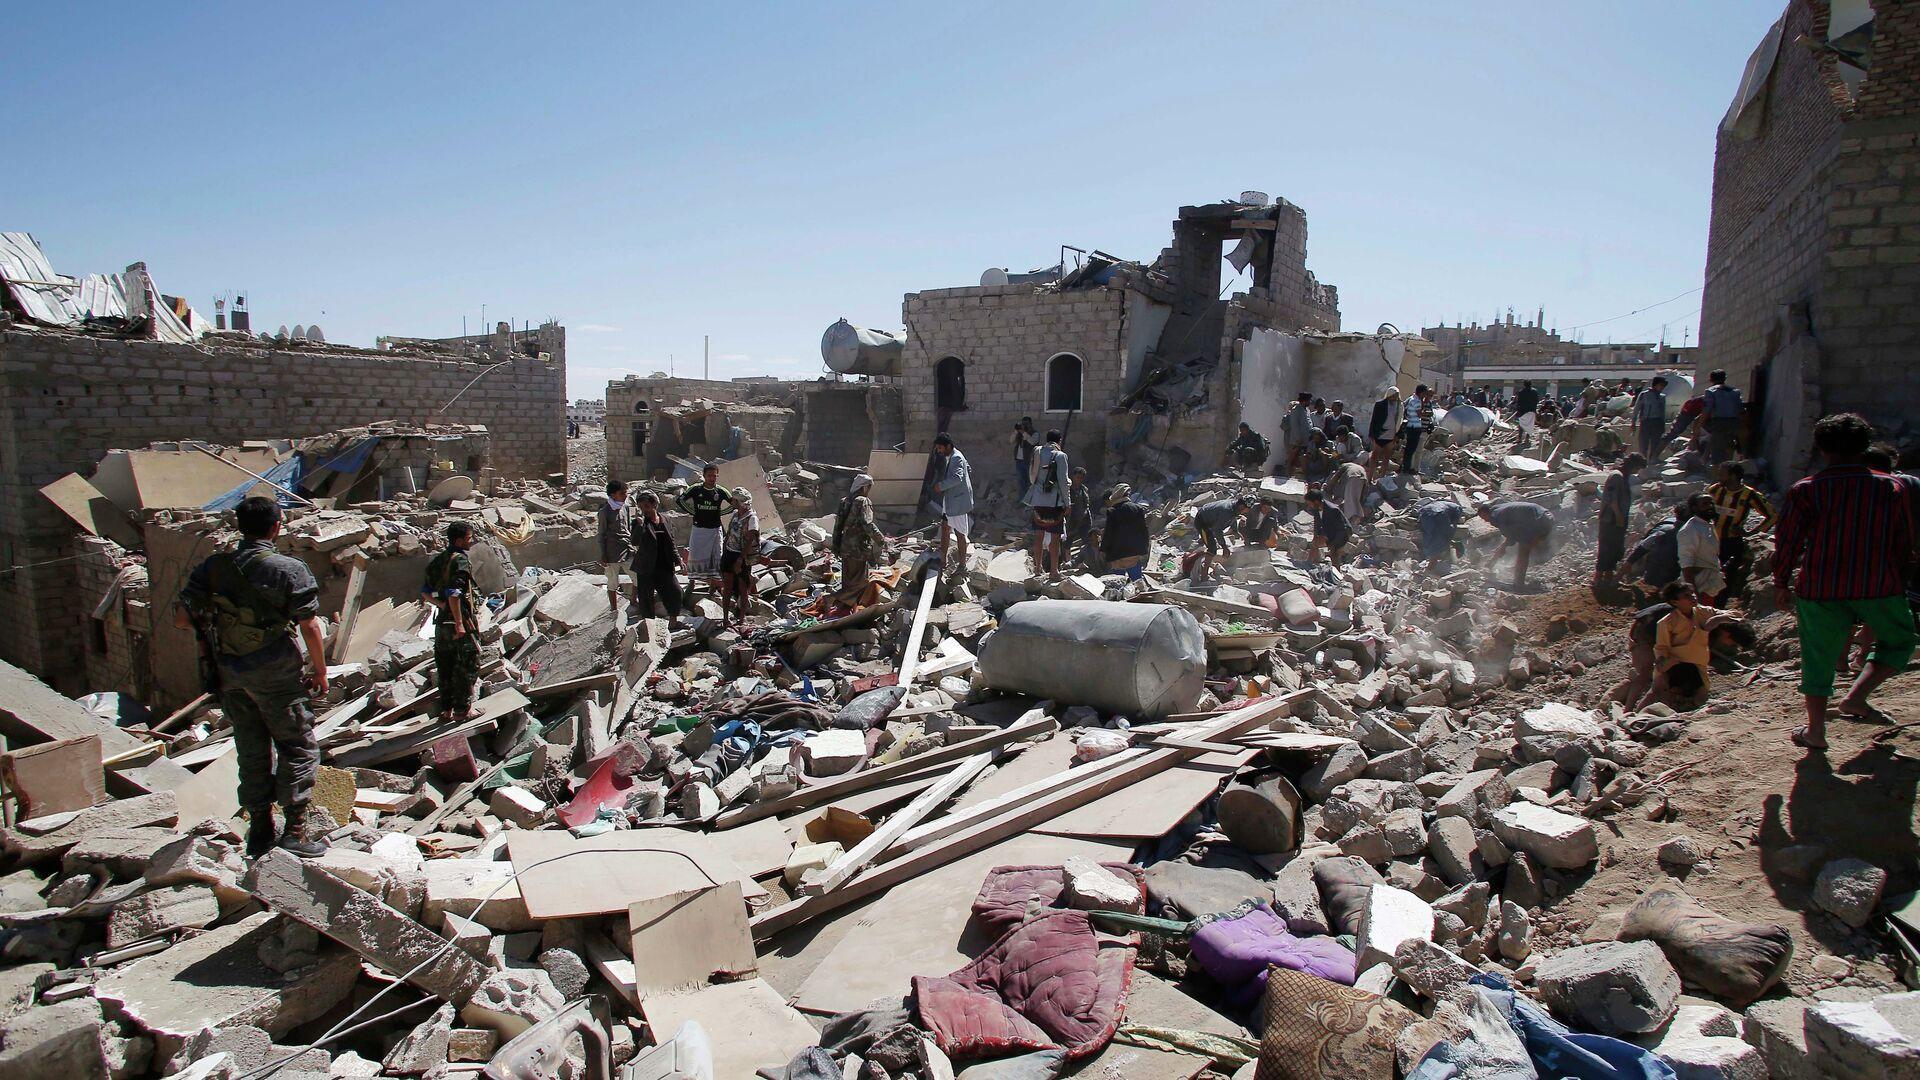 Situación en Yemen  - Sputnik Mundo, 1920, 27.05.2021